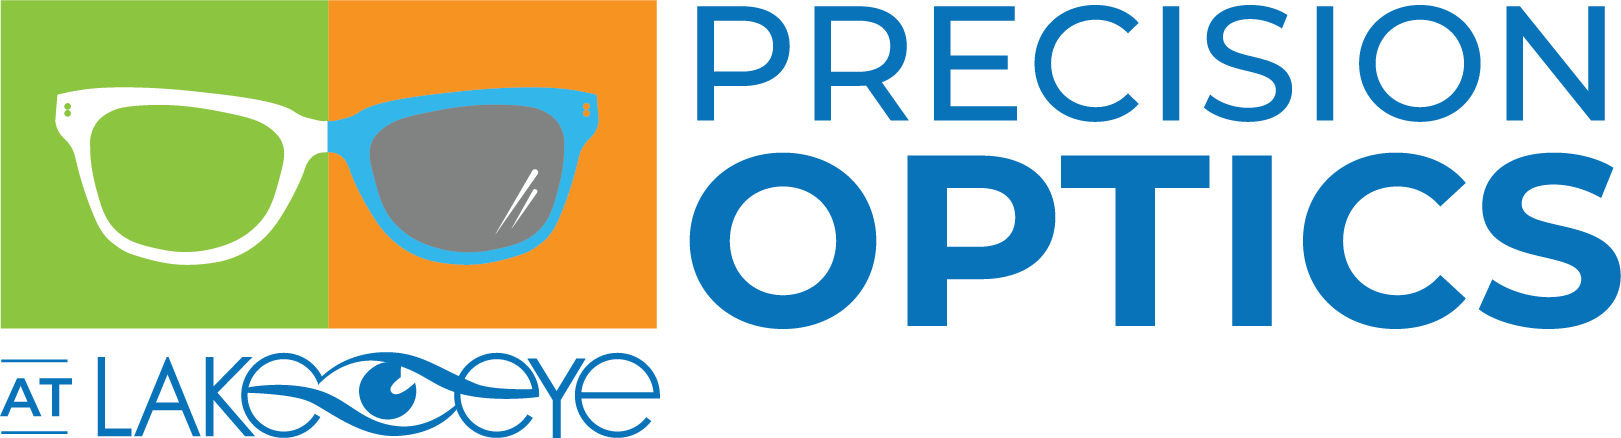 Precision Optics Icon